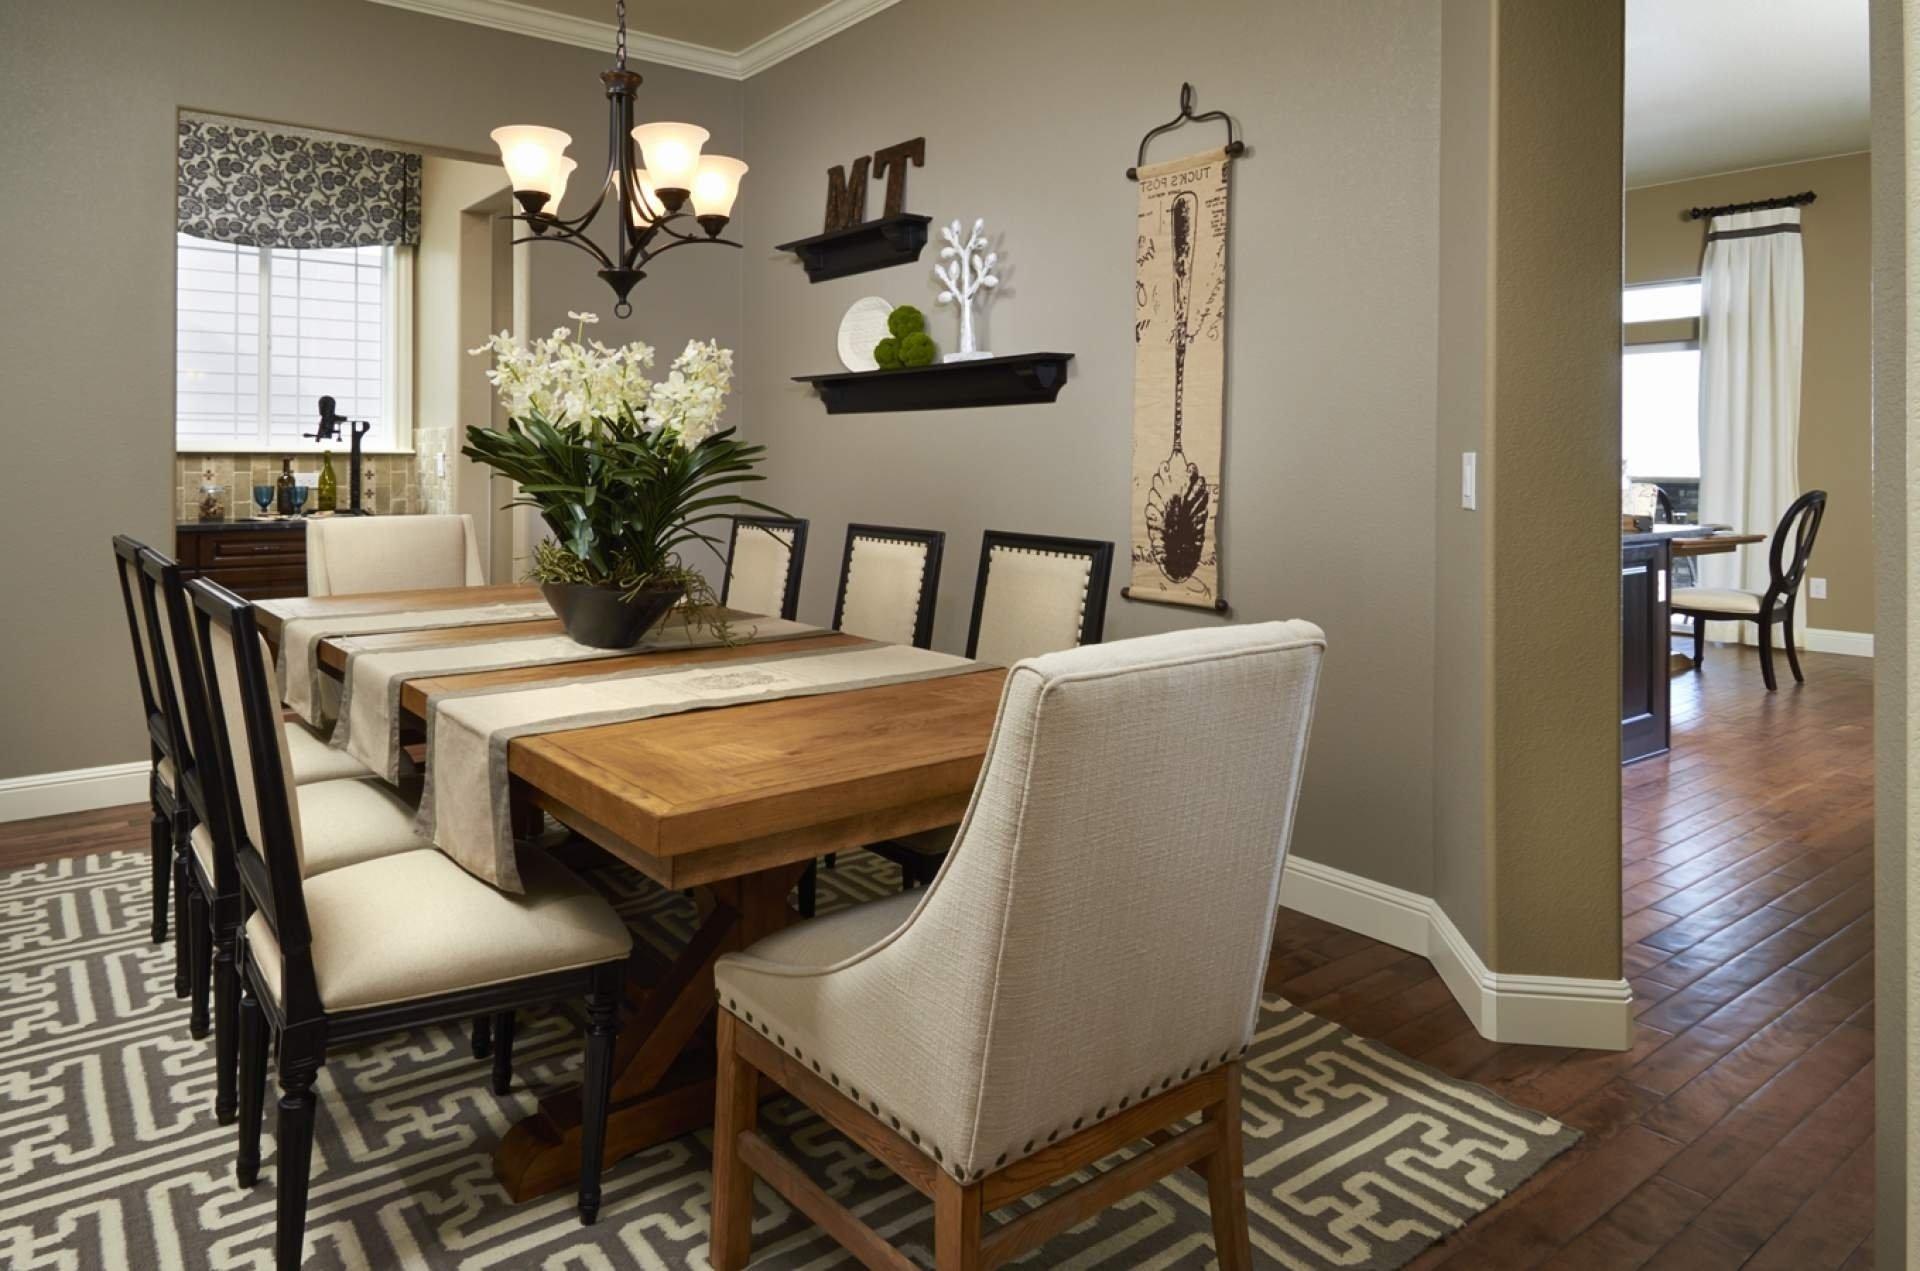 10 Stylish Dining Room Wall Art Ideas decorating ideas for dining room walls art galleries photos on 2020